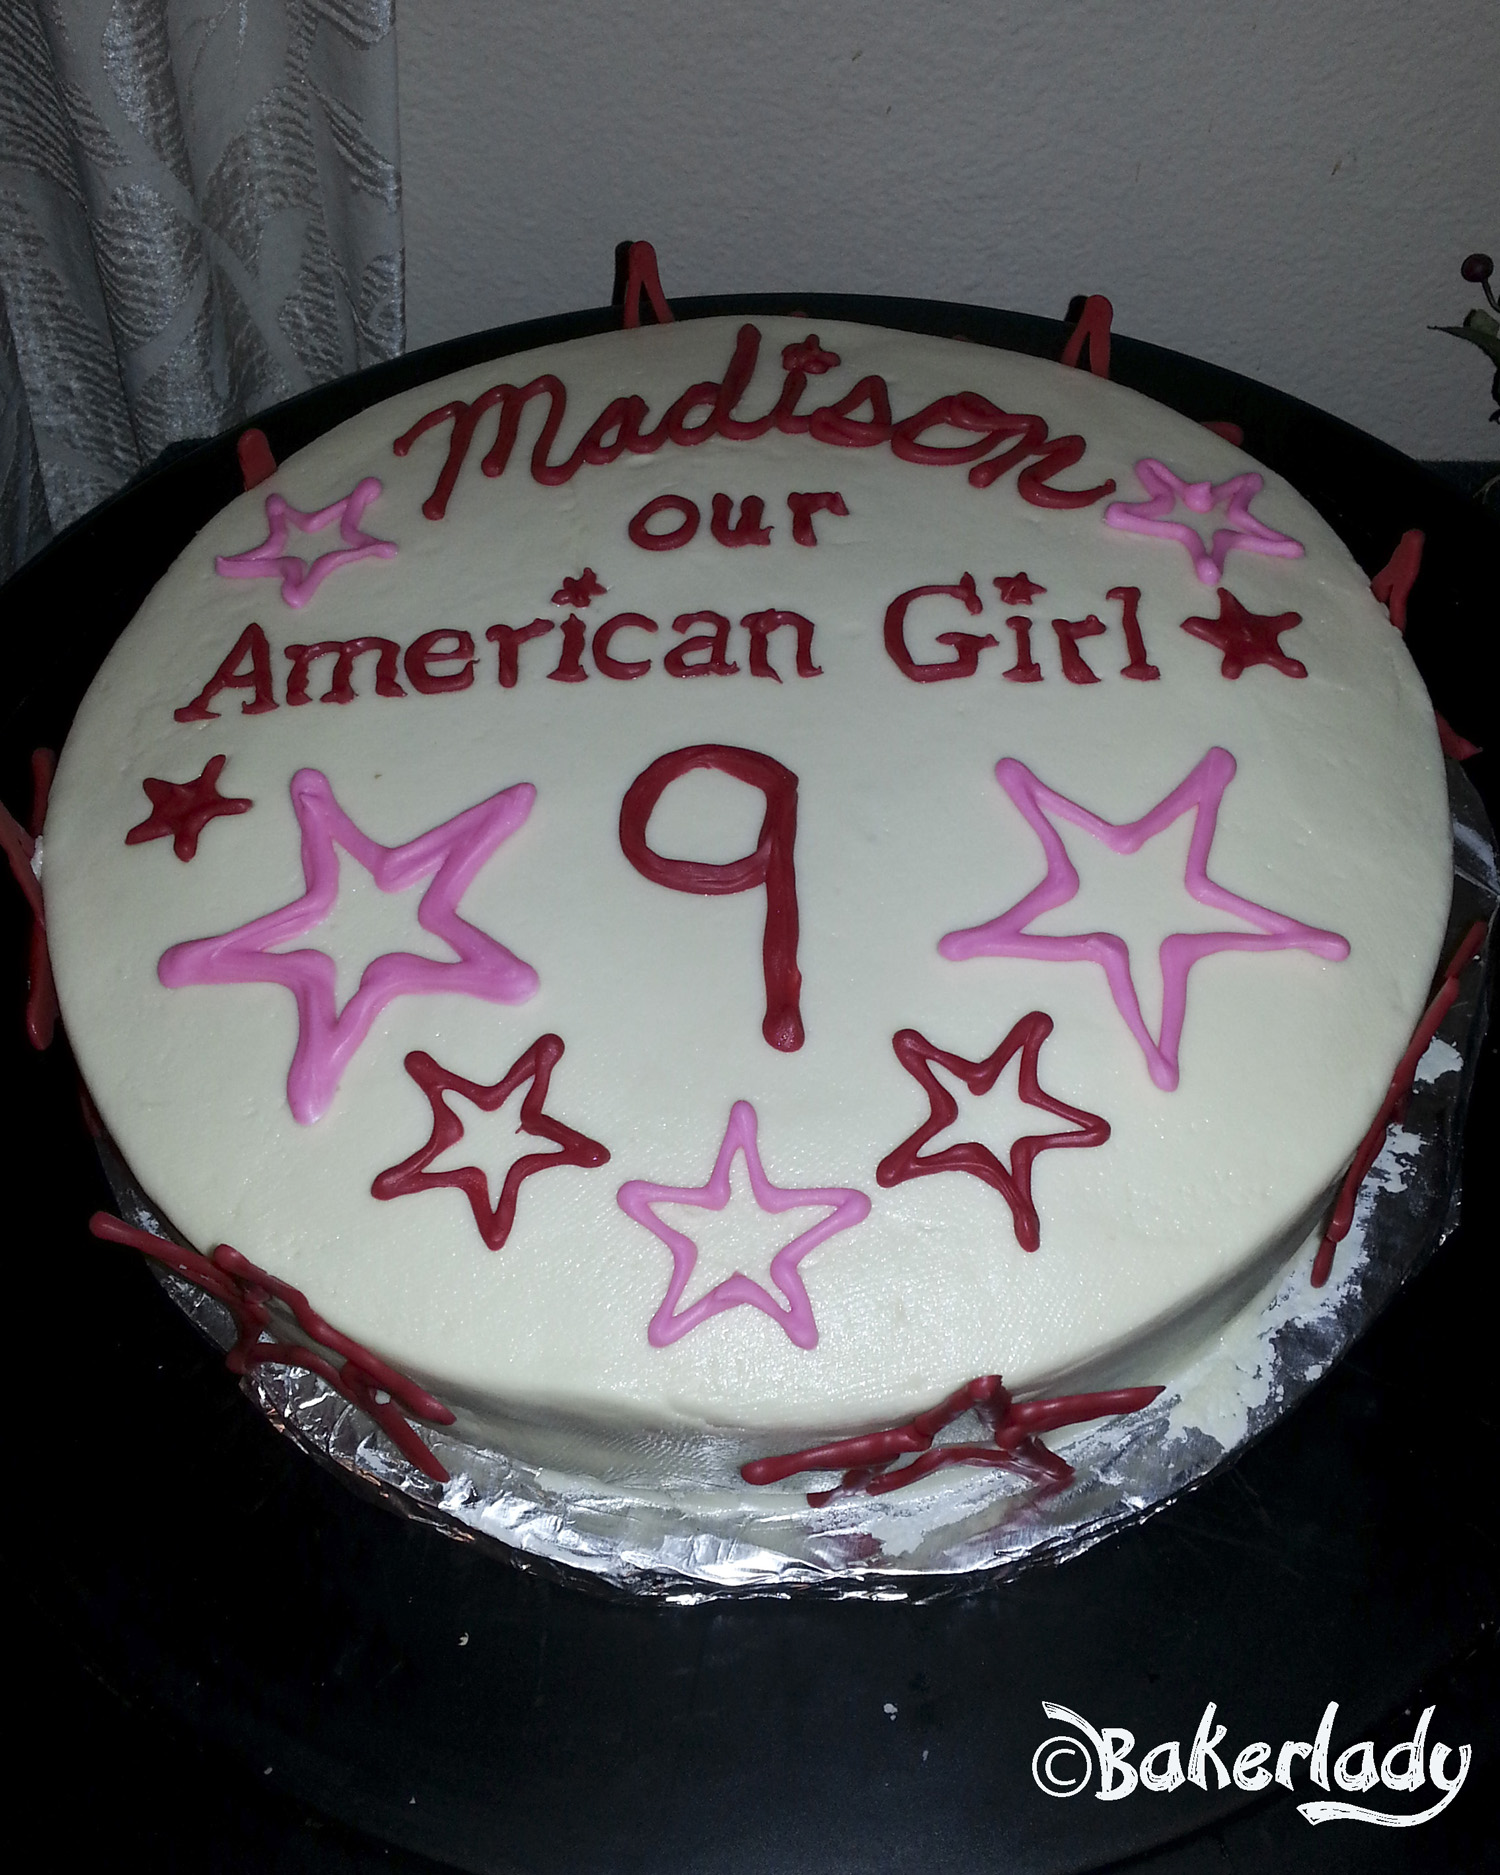 Swell American Girl Birthday Cake Bakerlady Personalised Birthday Cards Paralily Jamesorg